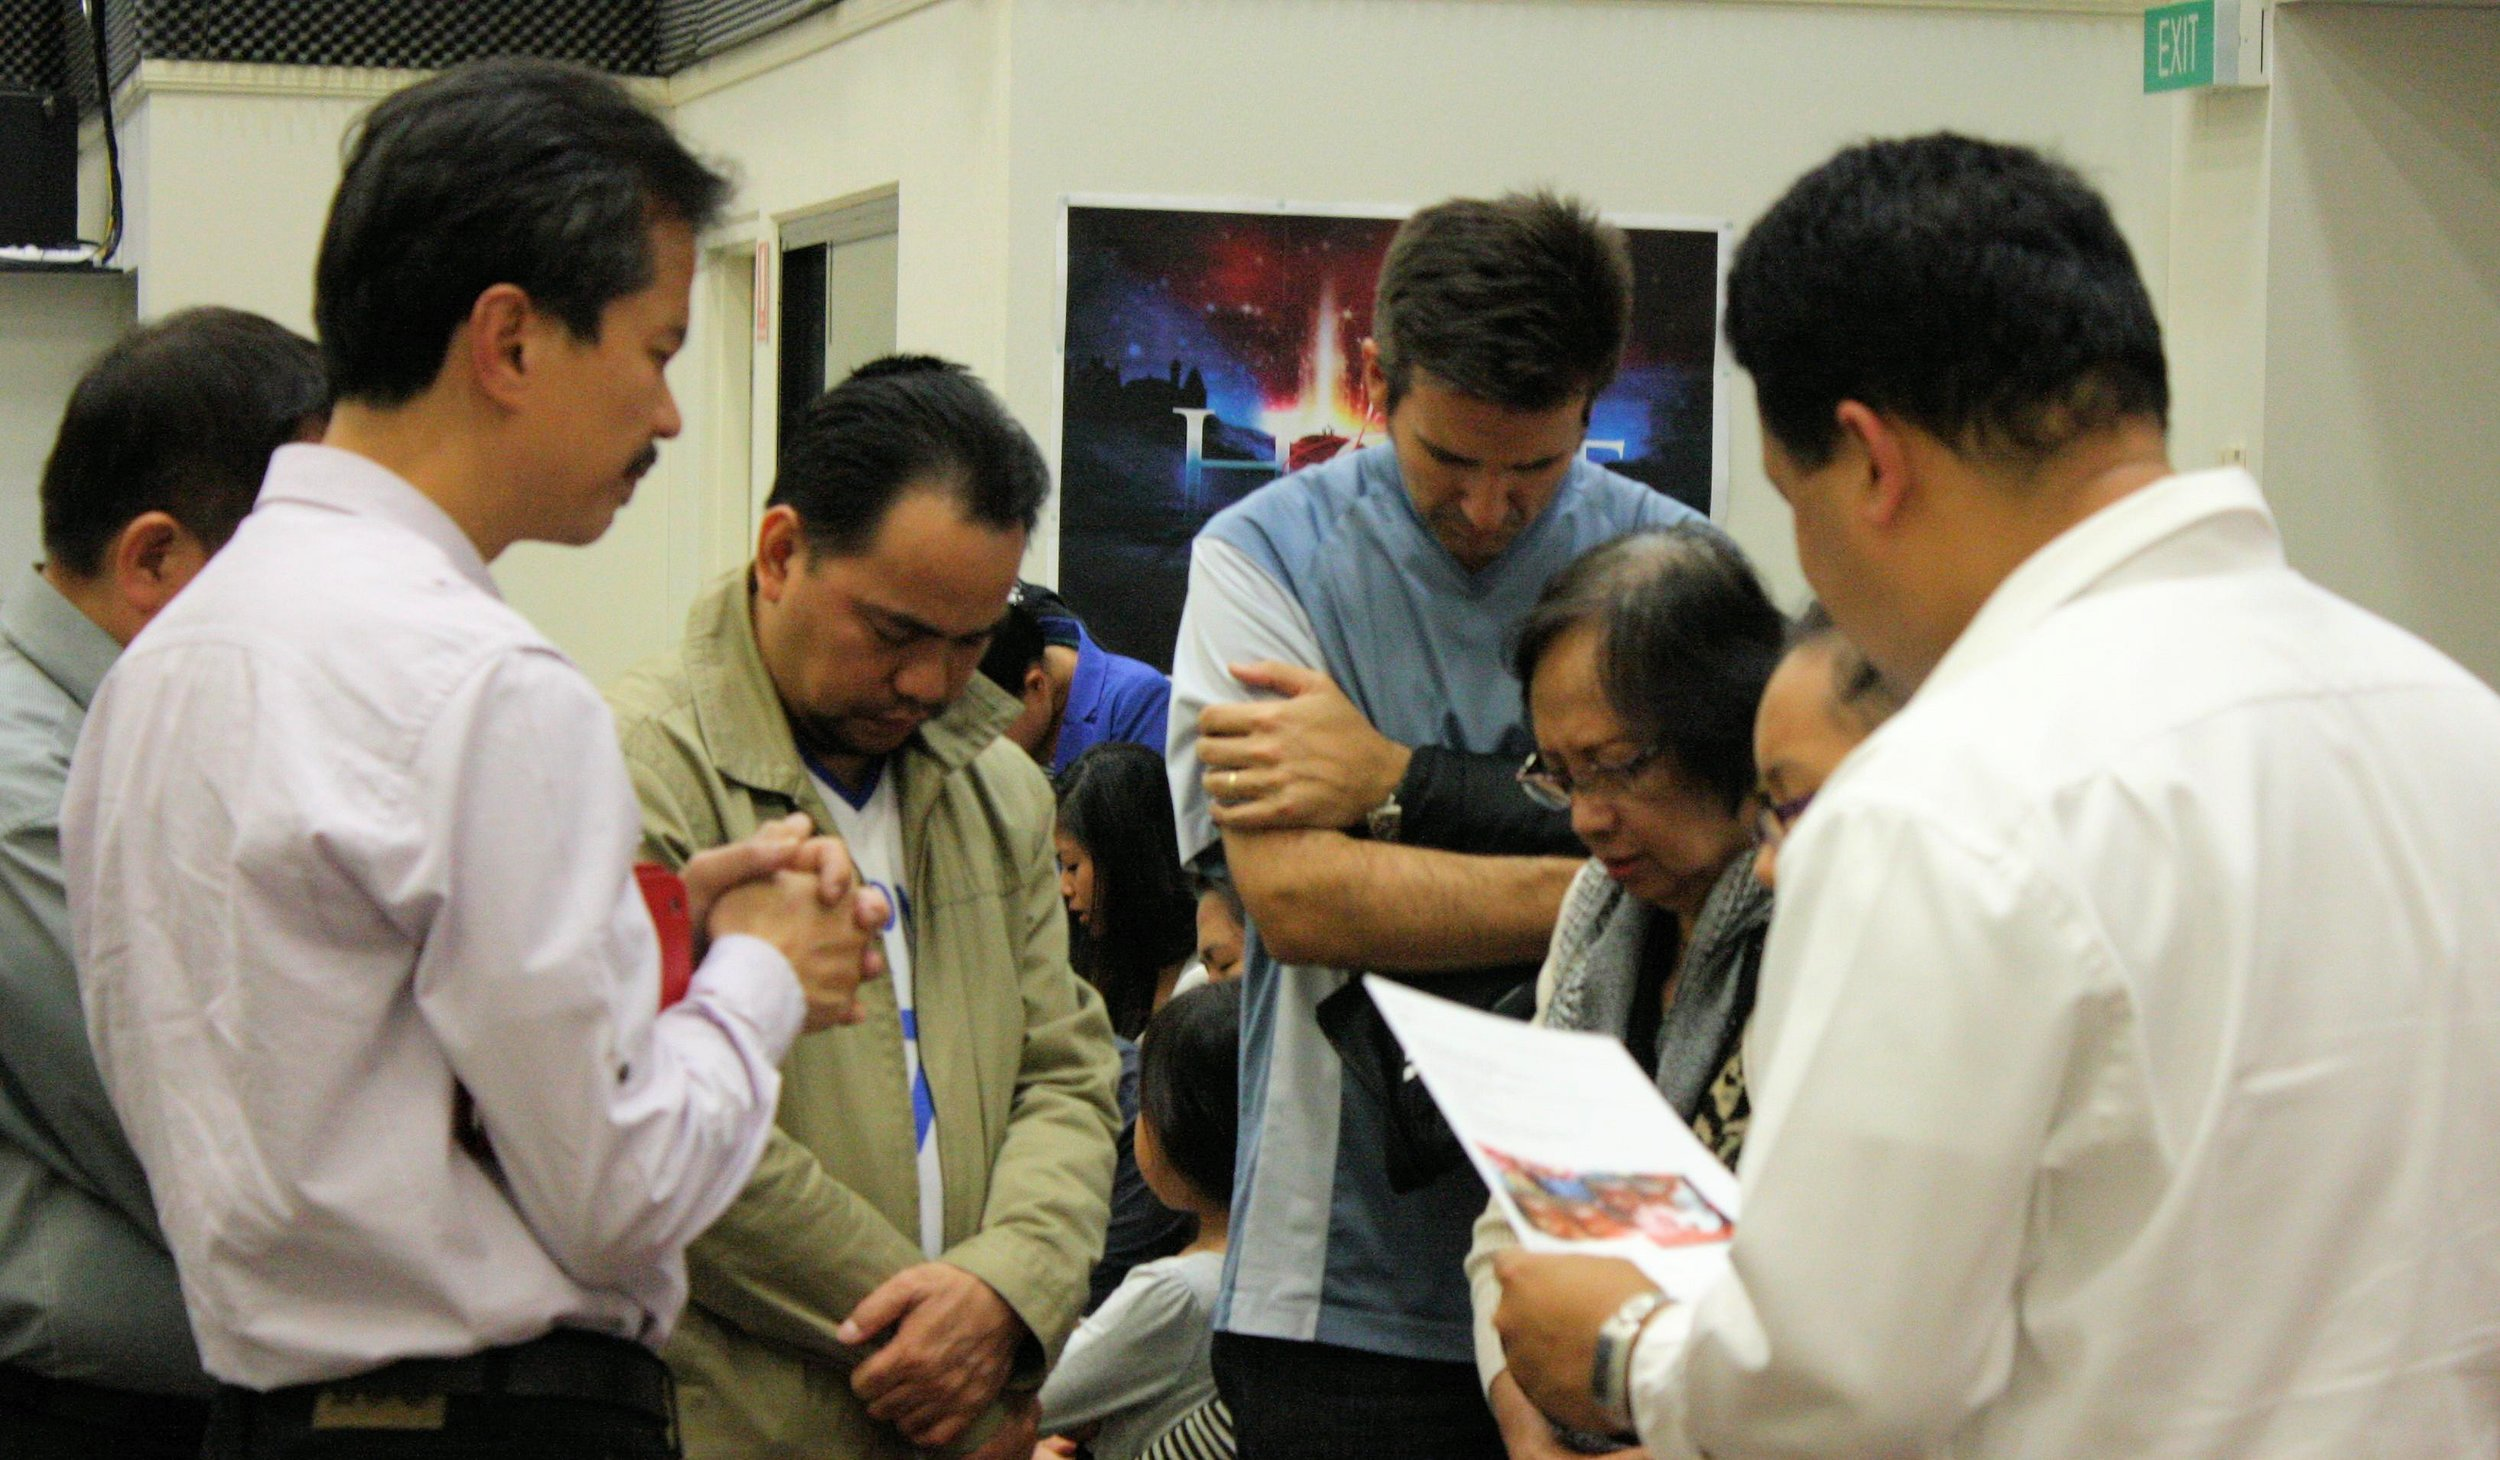 prayer-service 2.JPG